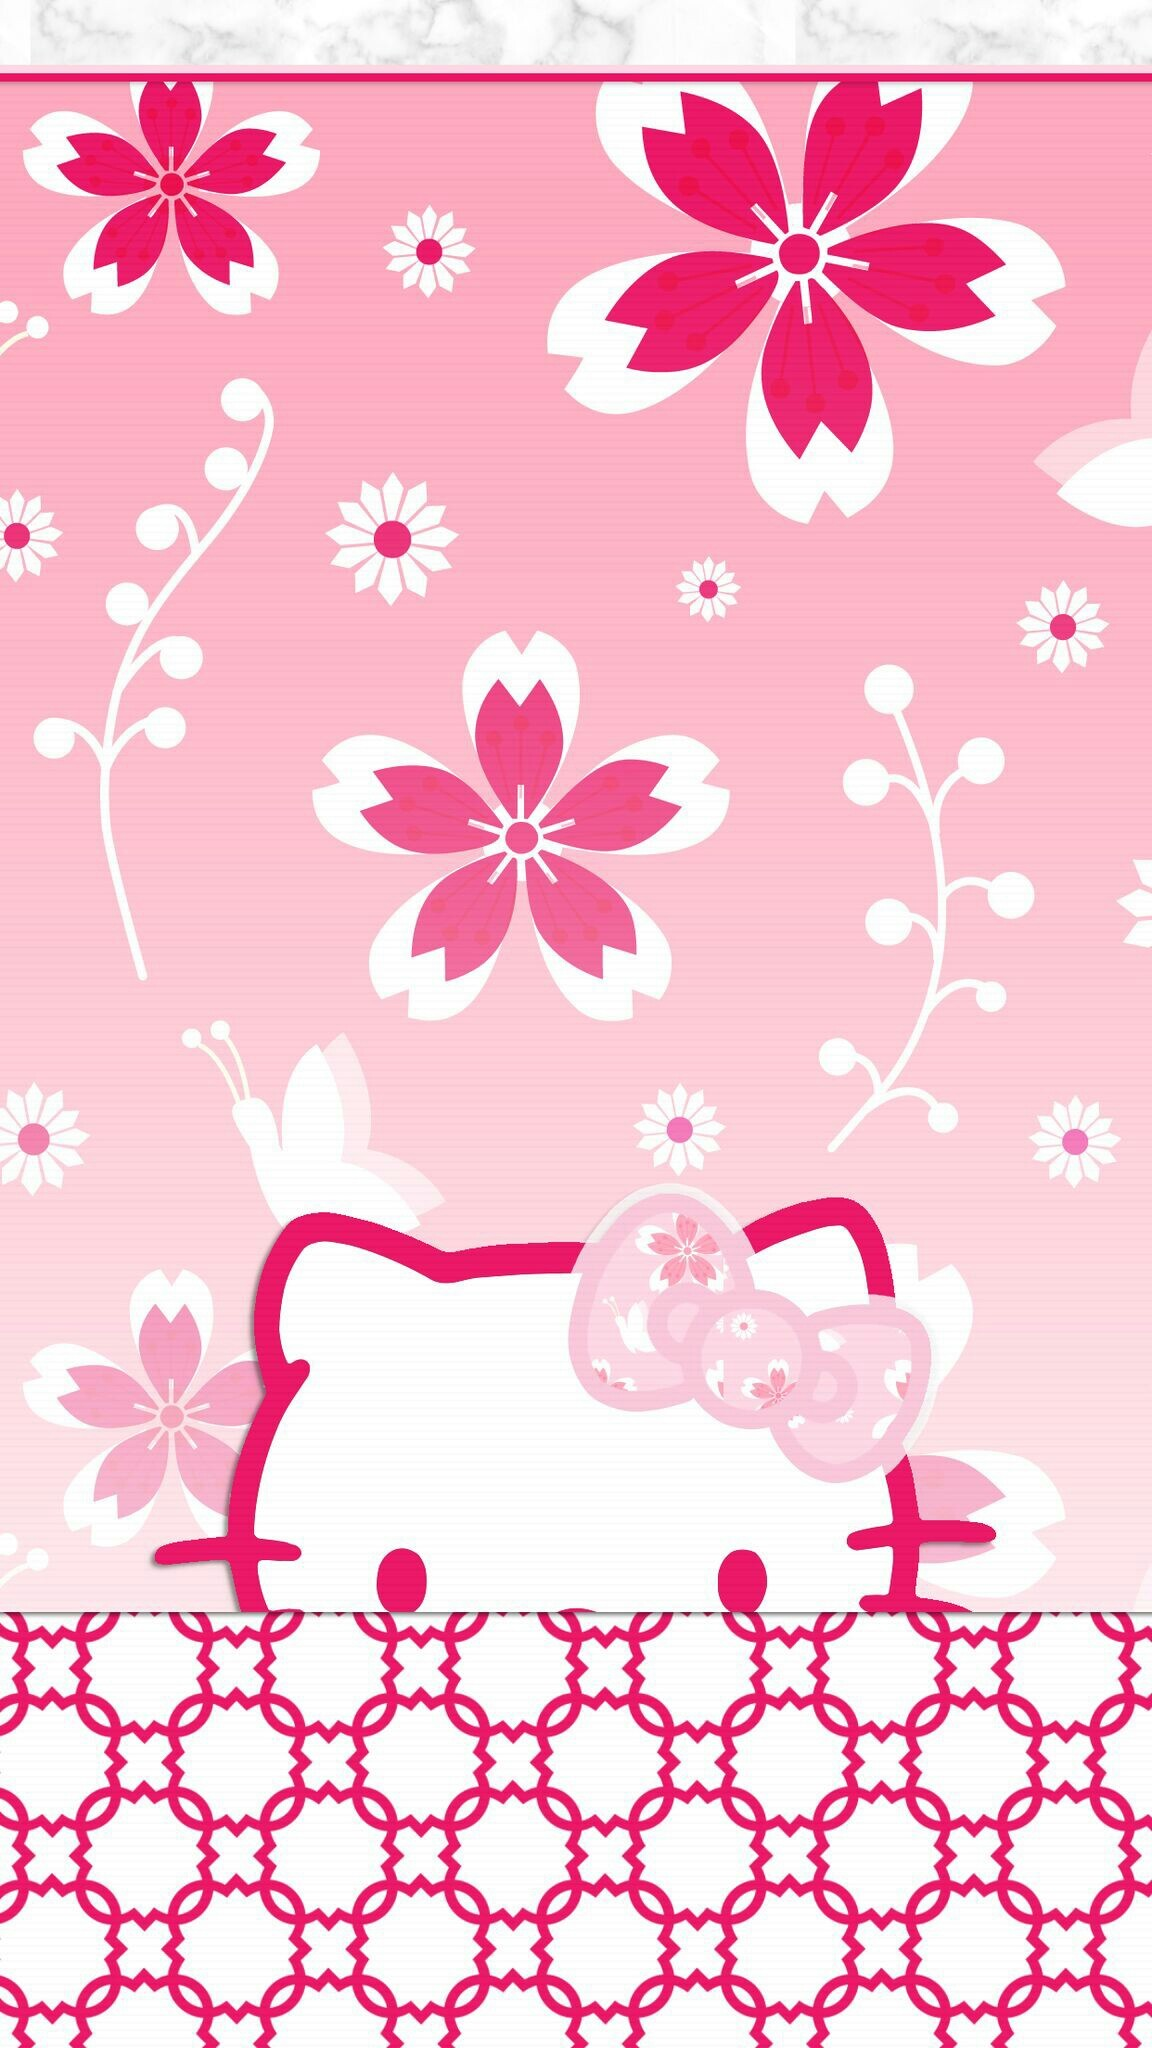 Amazing Wallpaper Hello Kitty Coffee - 929203-popular-cute-wallpapers-of-hello-kitty-1152x2048  Image_20440.jpg